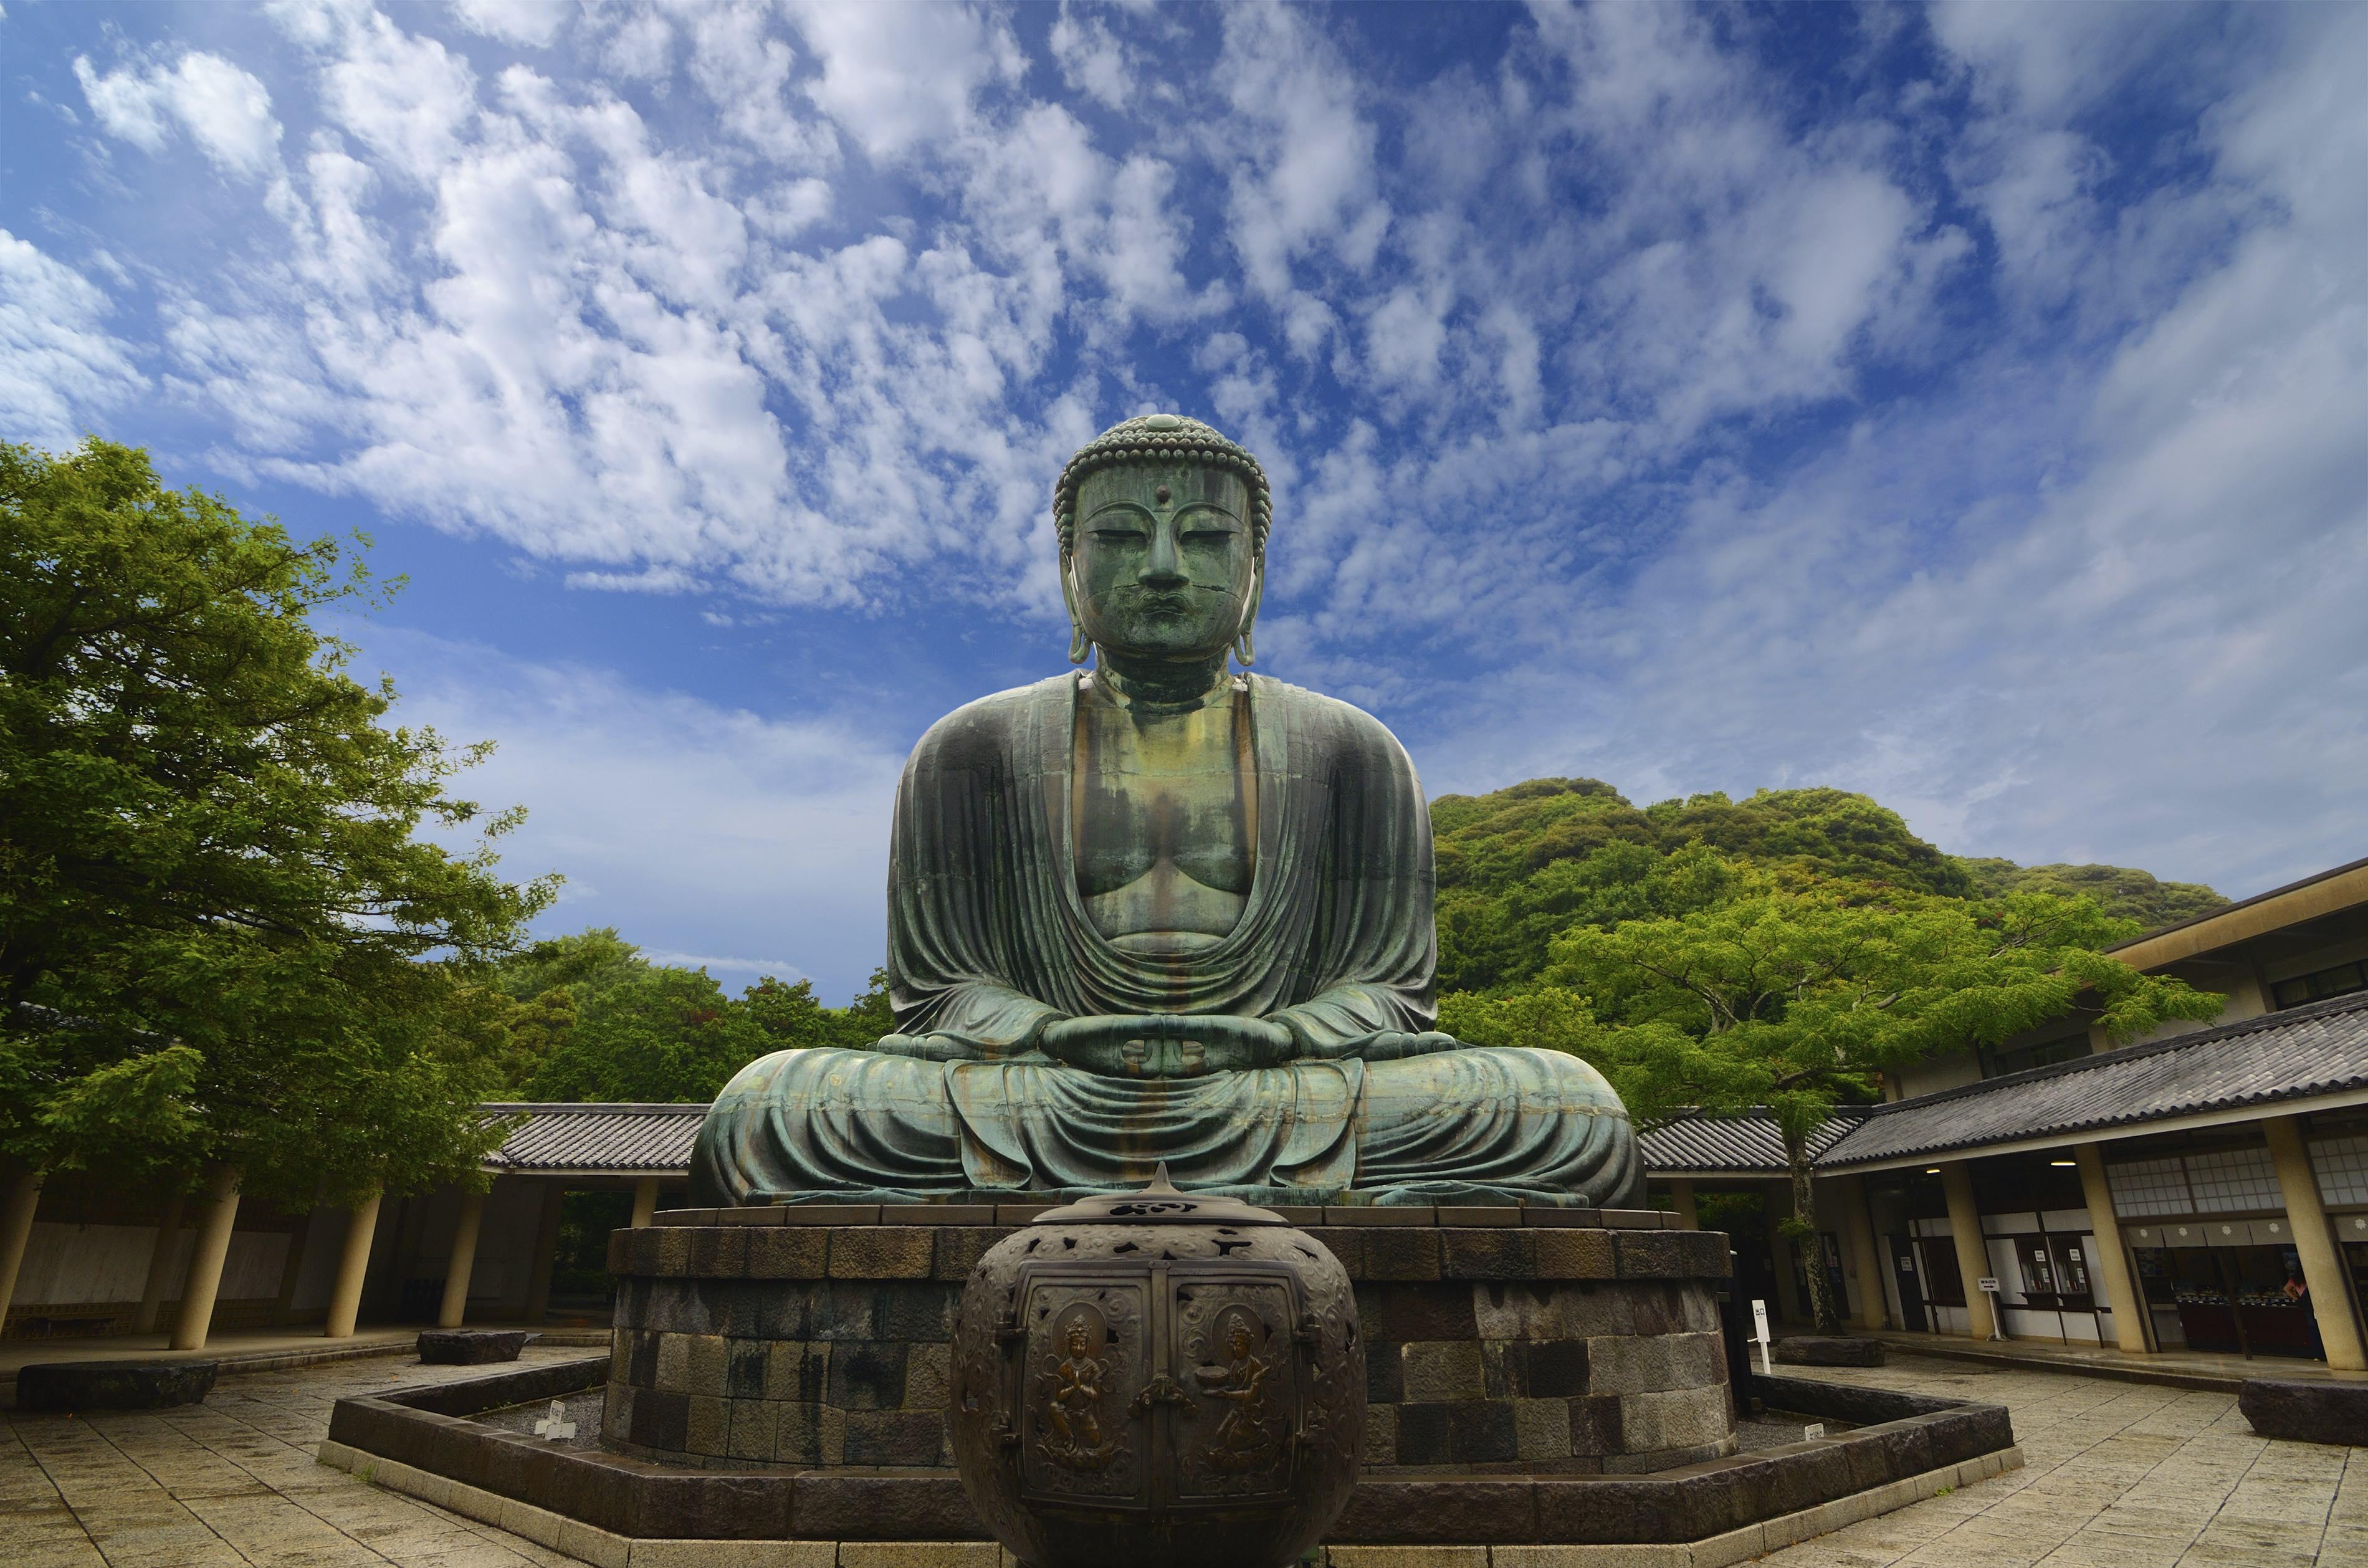 Kamakura Daibutsu (Great Buddha) - GaijinPot Travel